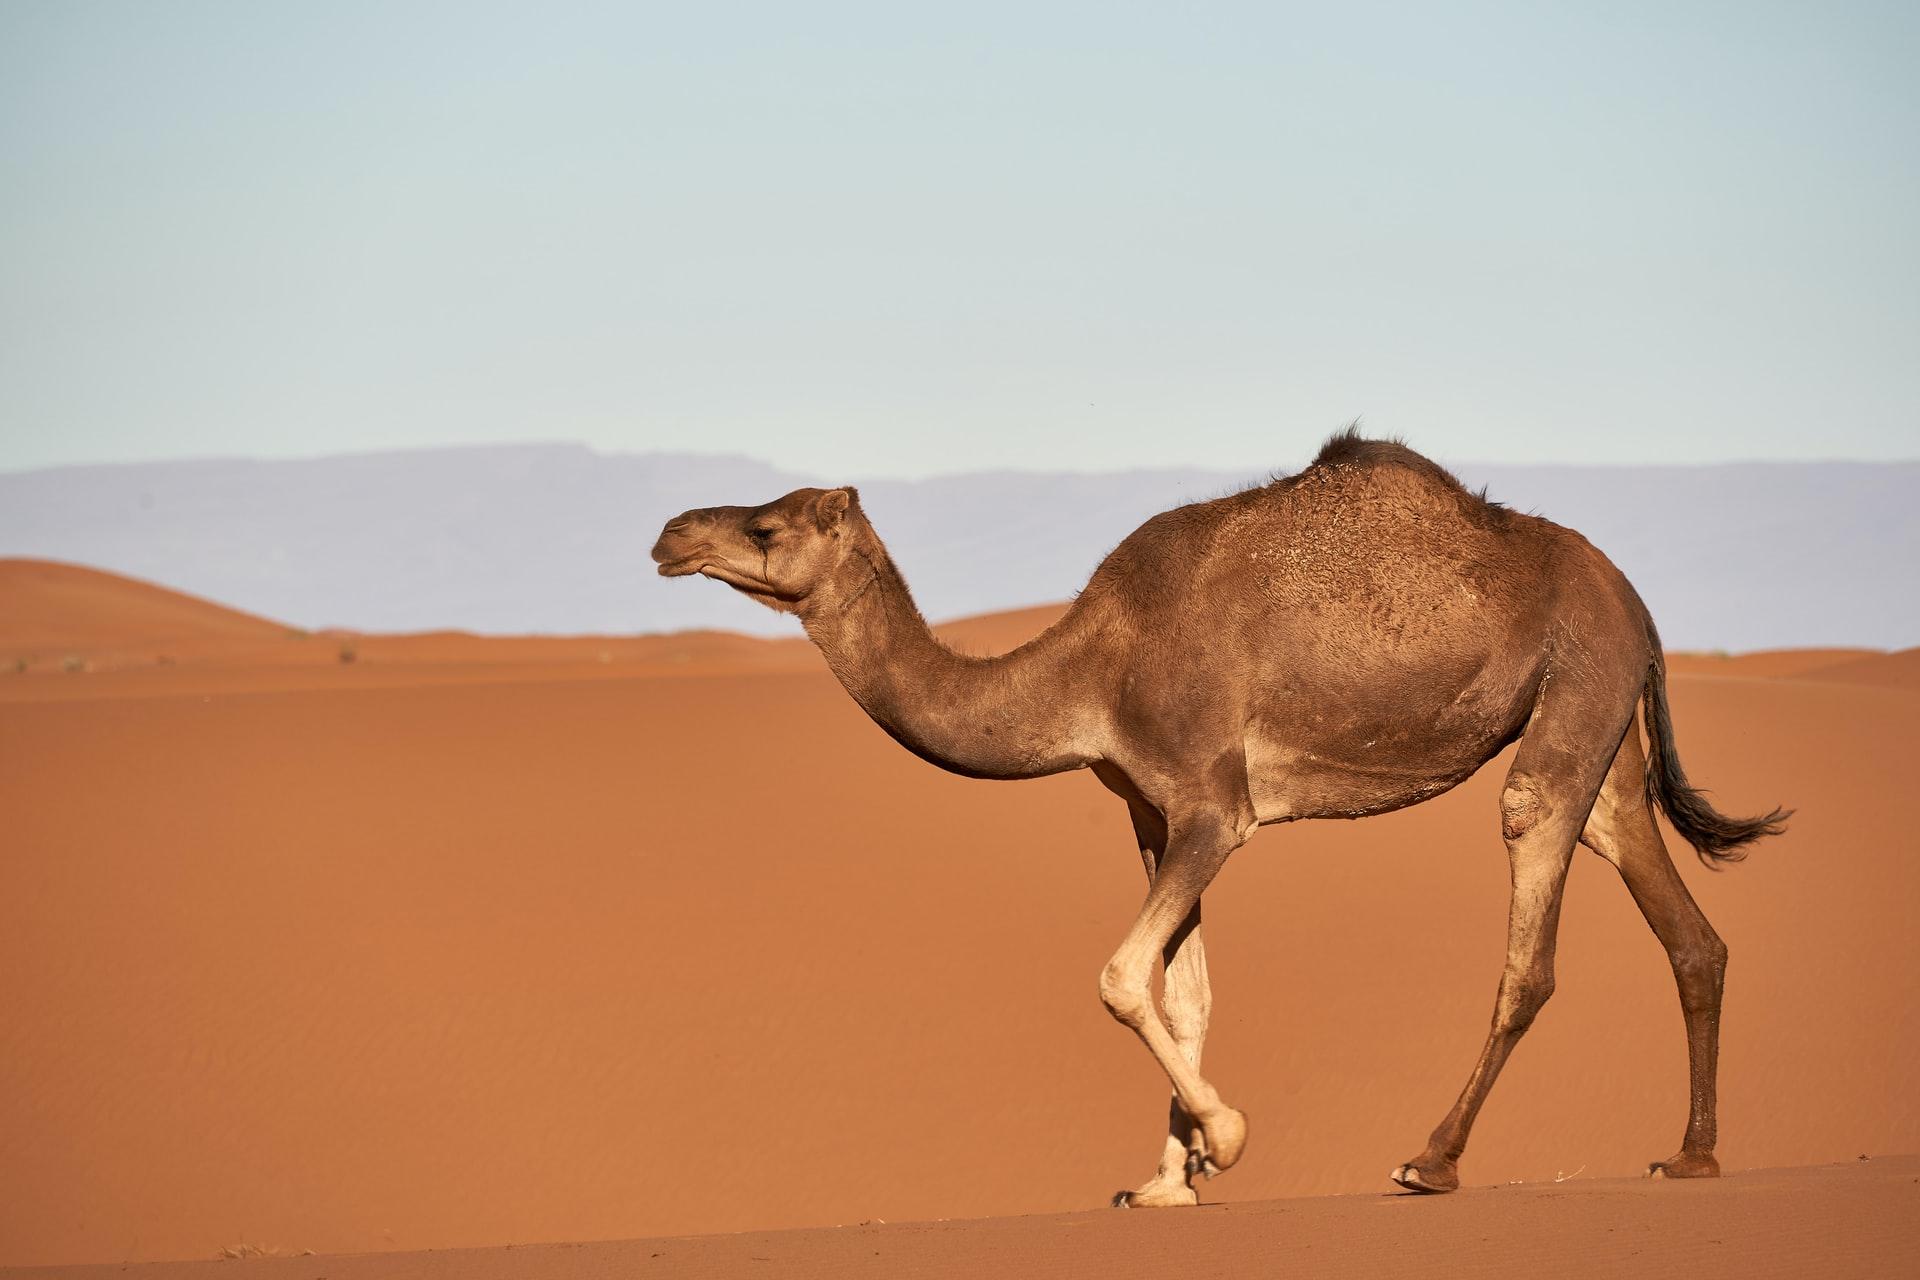 A beautiful camel in a beautiful desert.